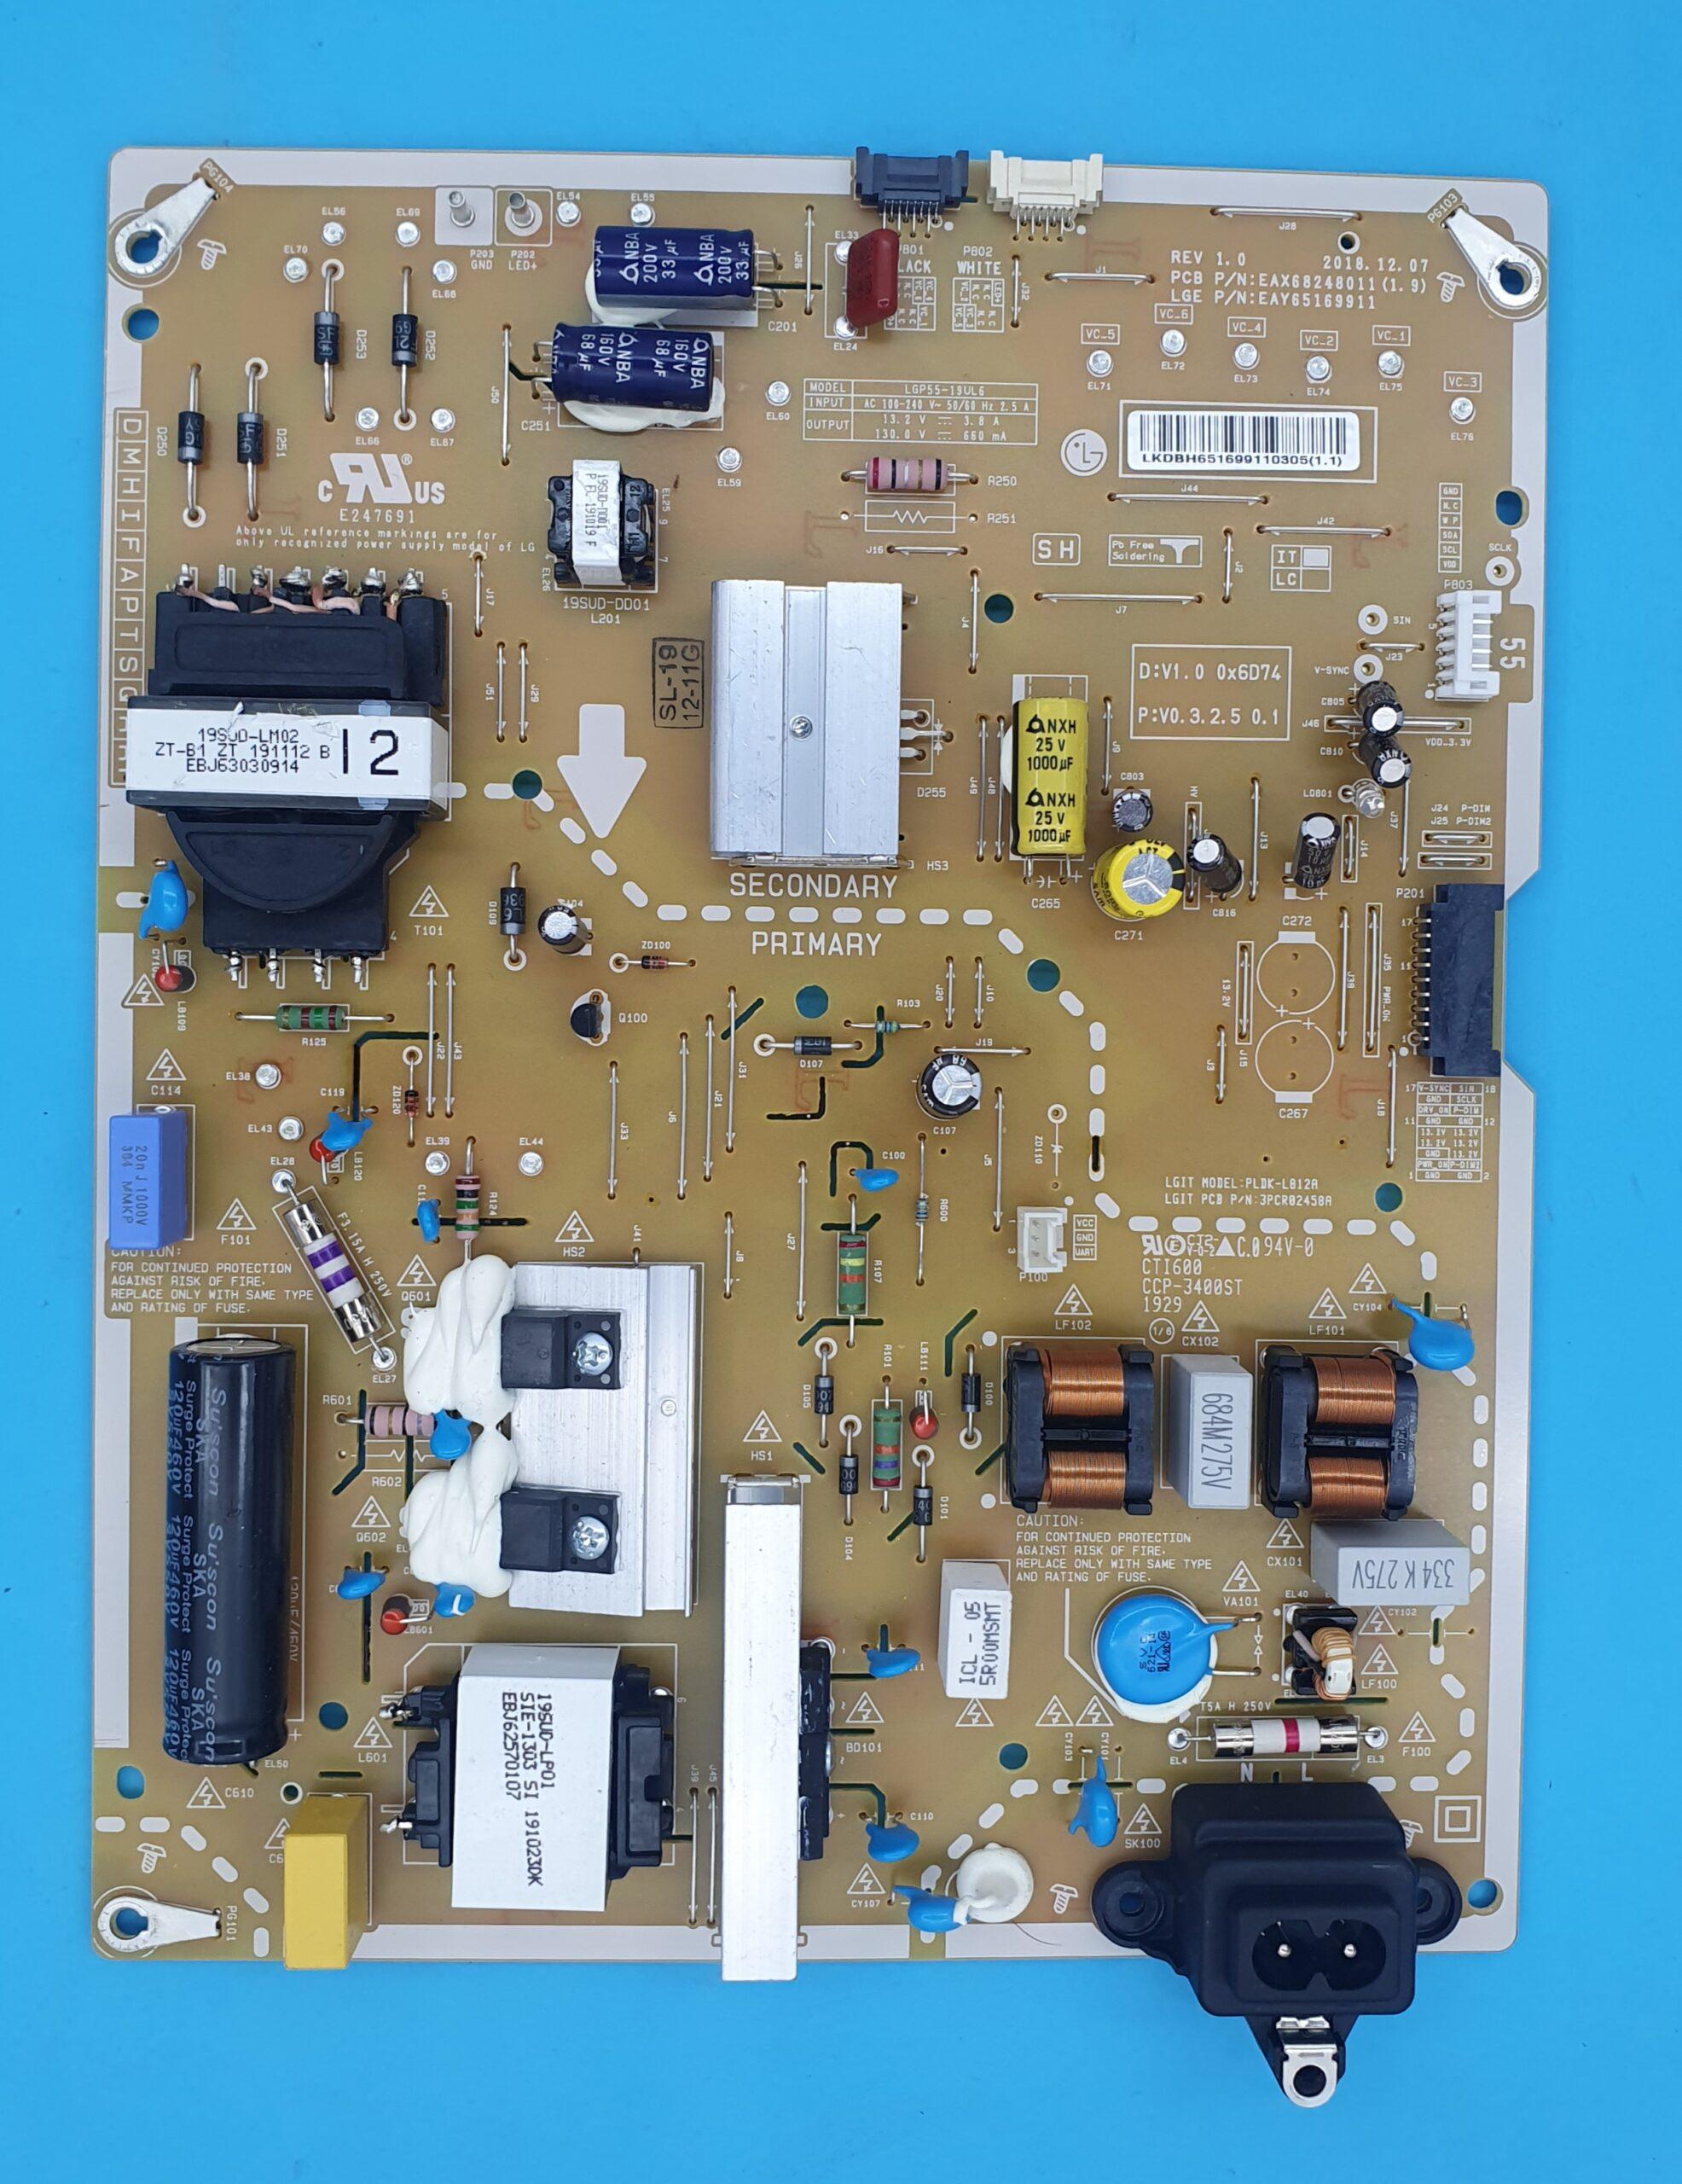 EAX68248011 LG Power (KDV DAHİL = 300 TL)